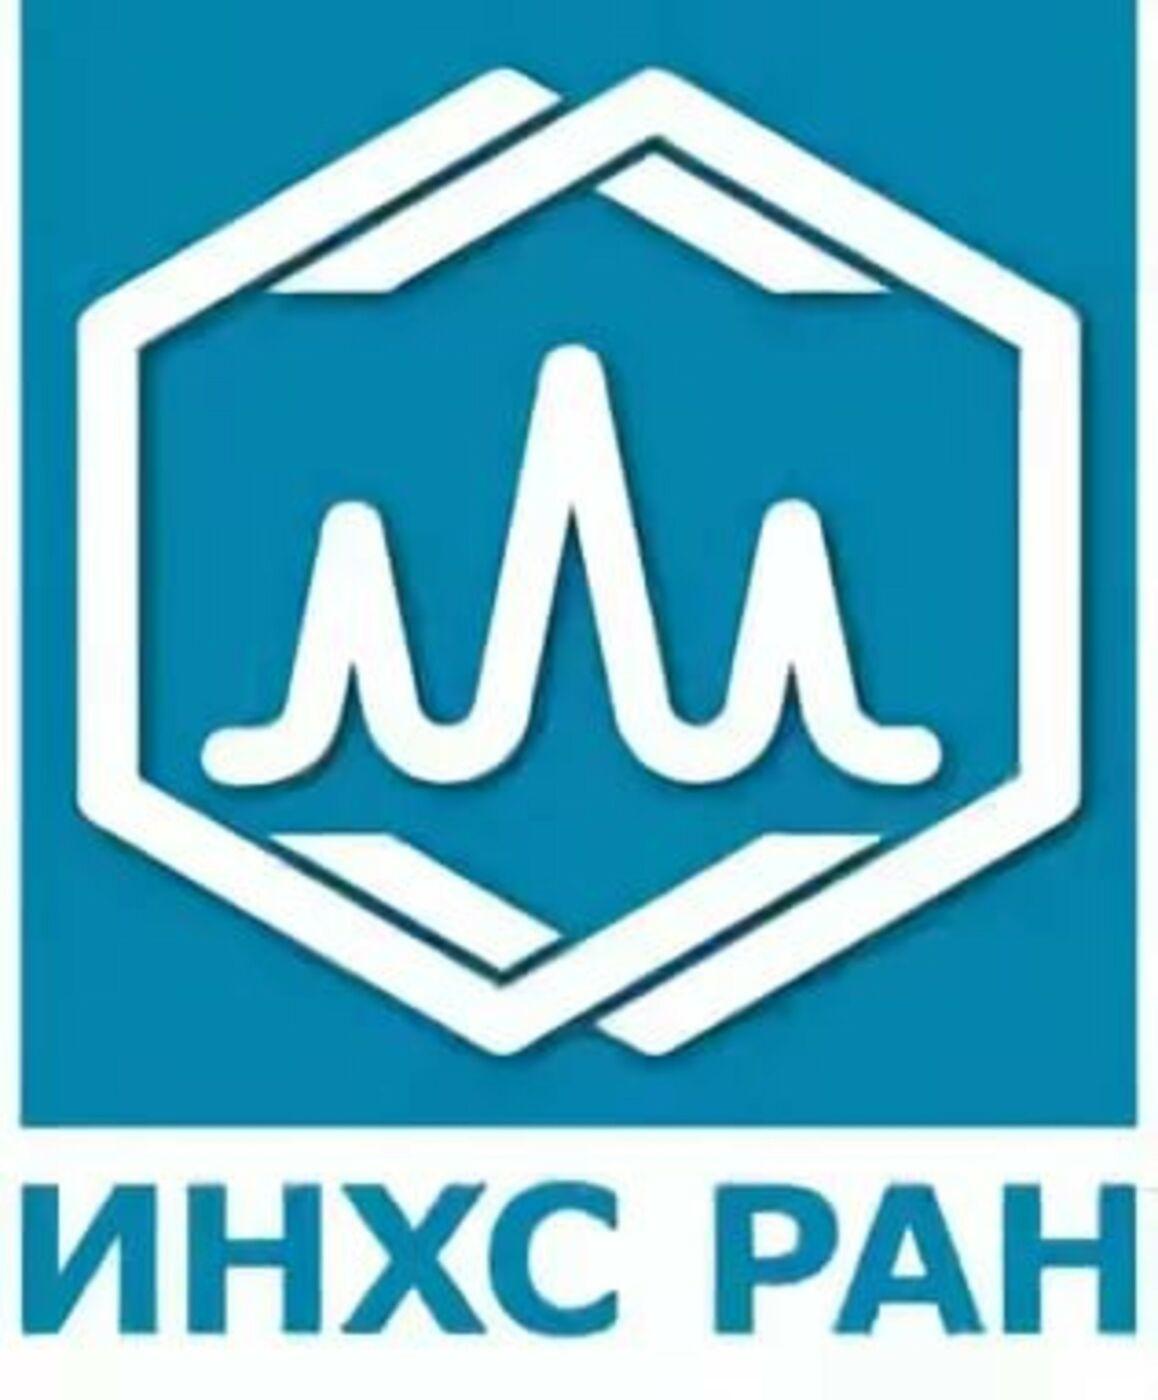 инхс лого